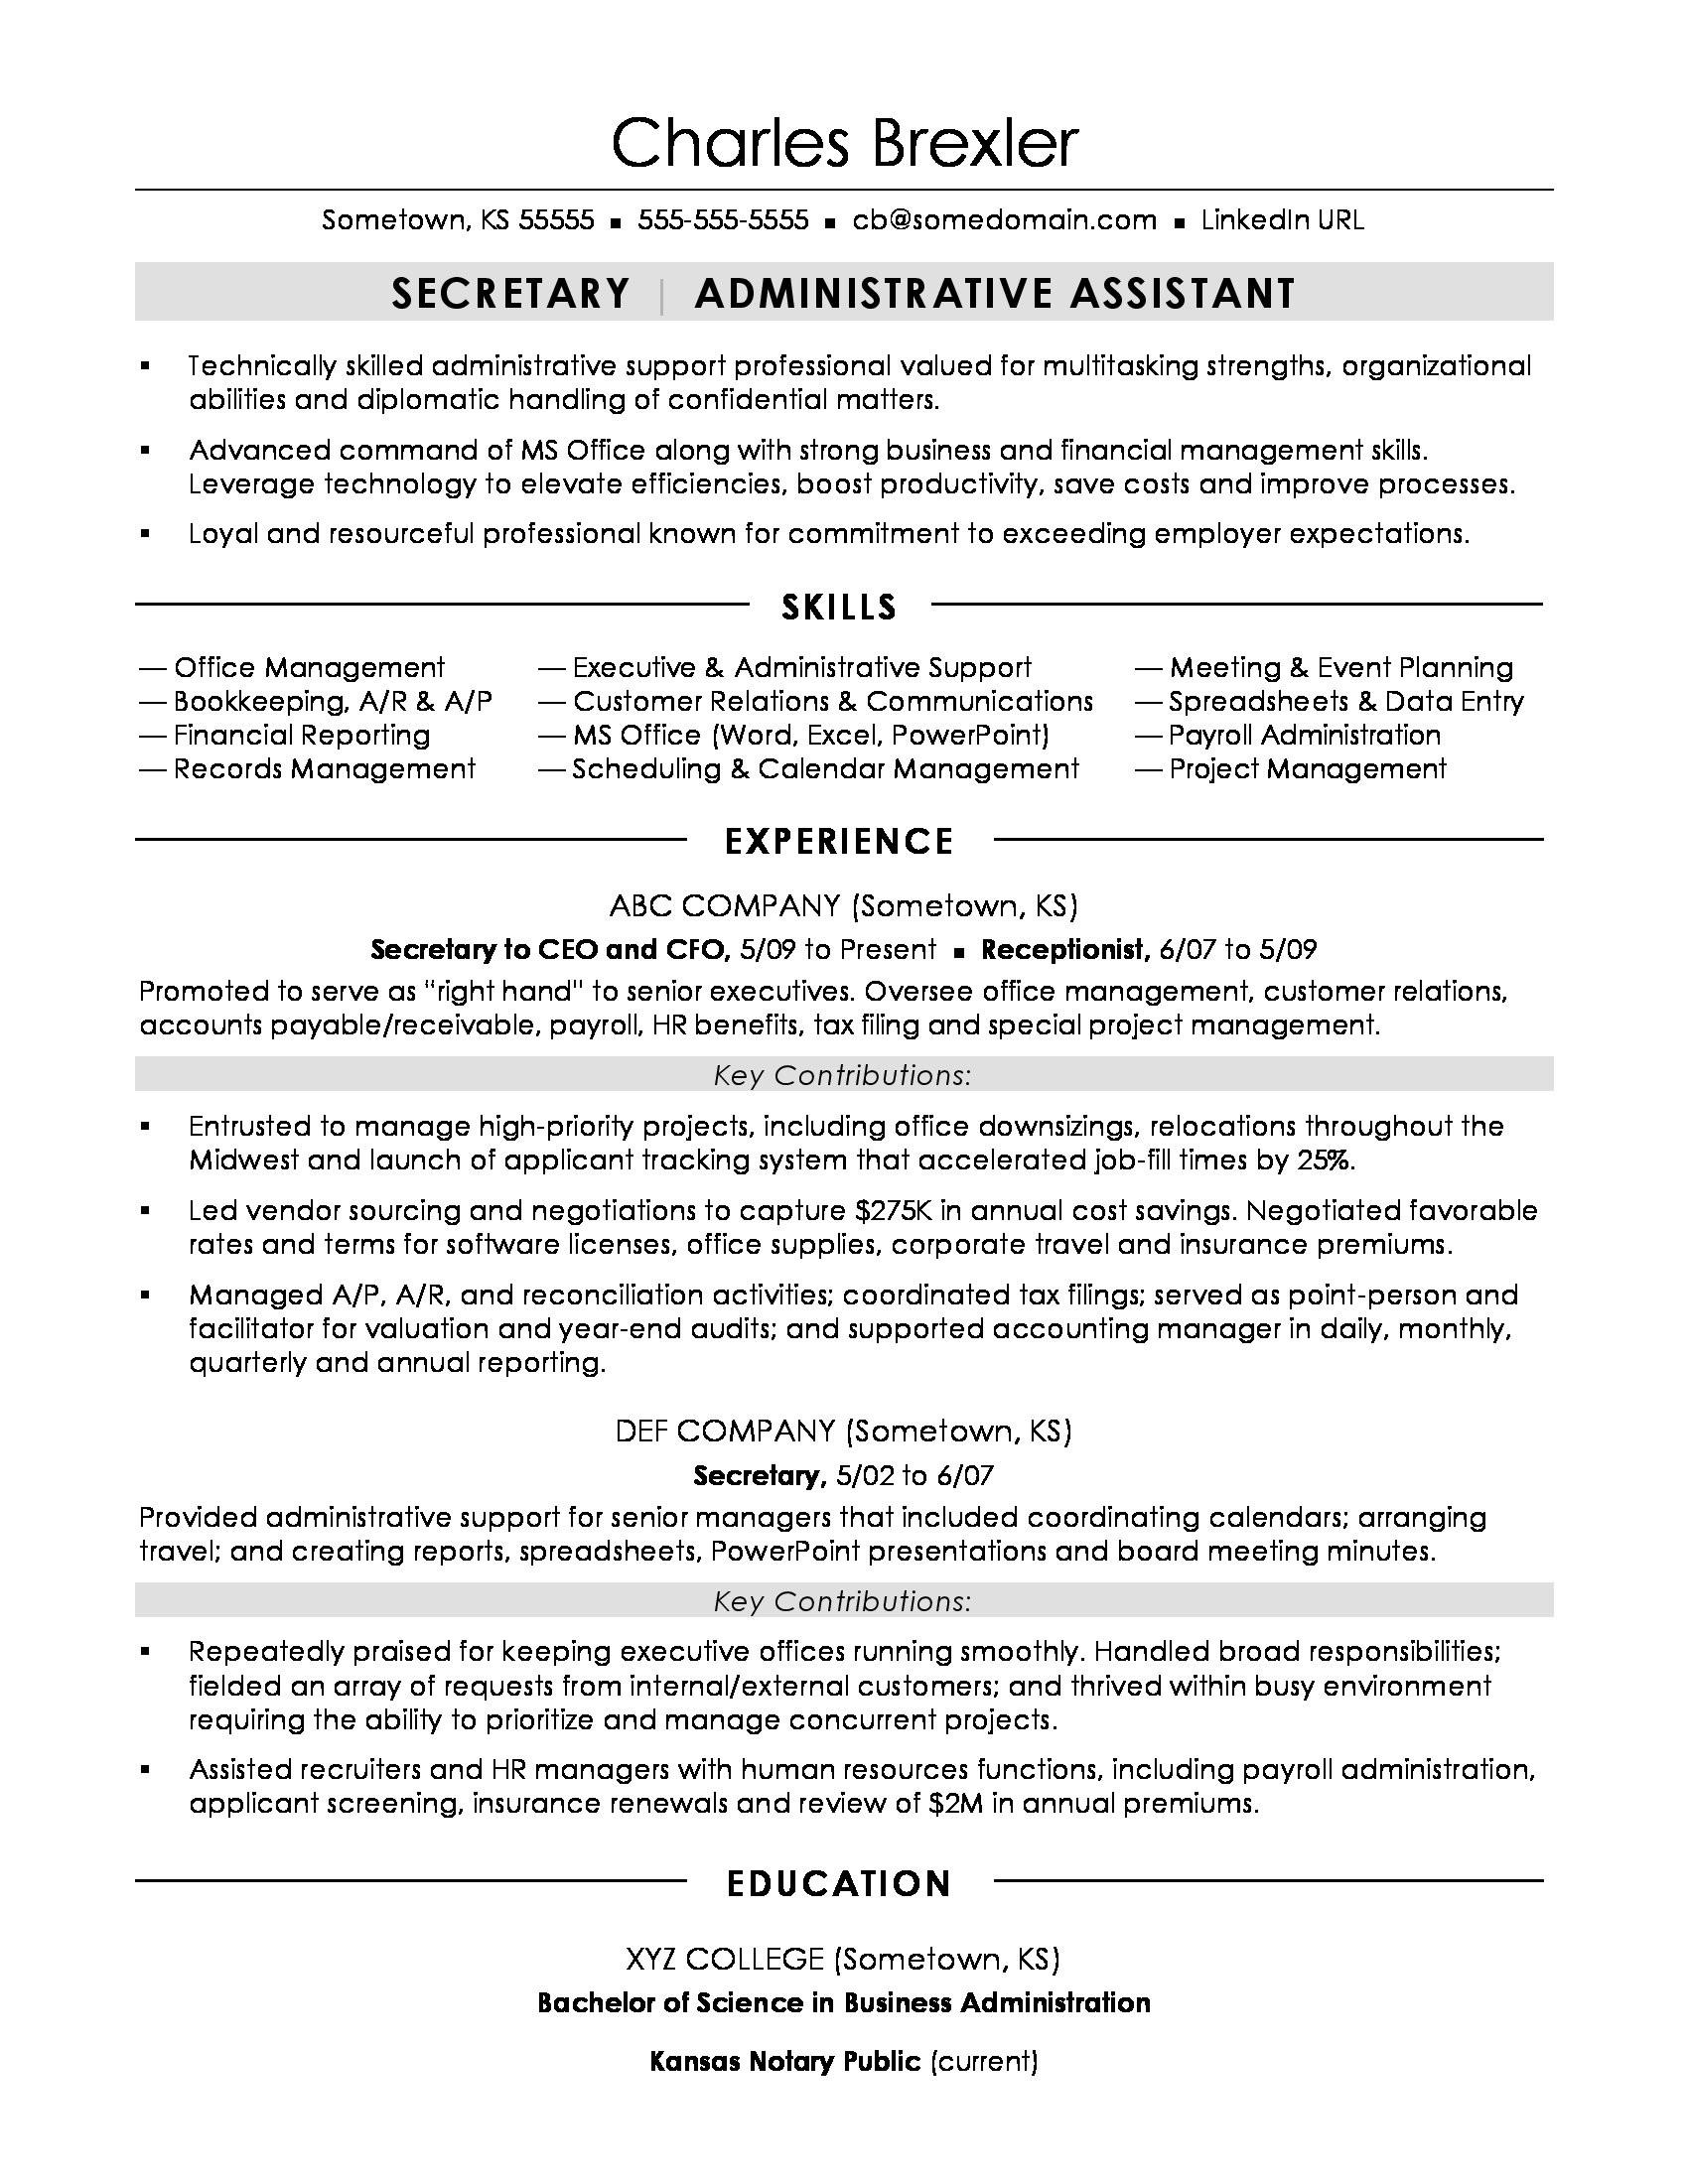 Sample Resume for Secretaries Secretary Resume Sample